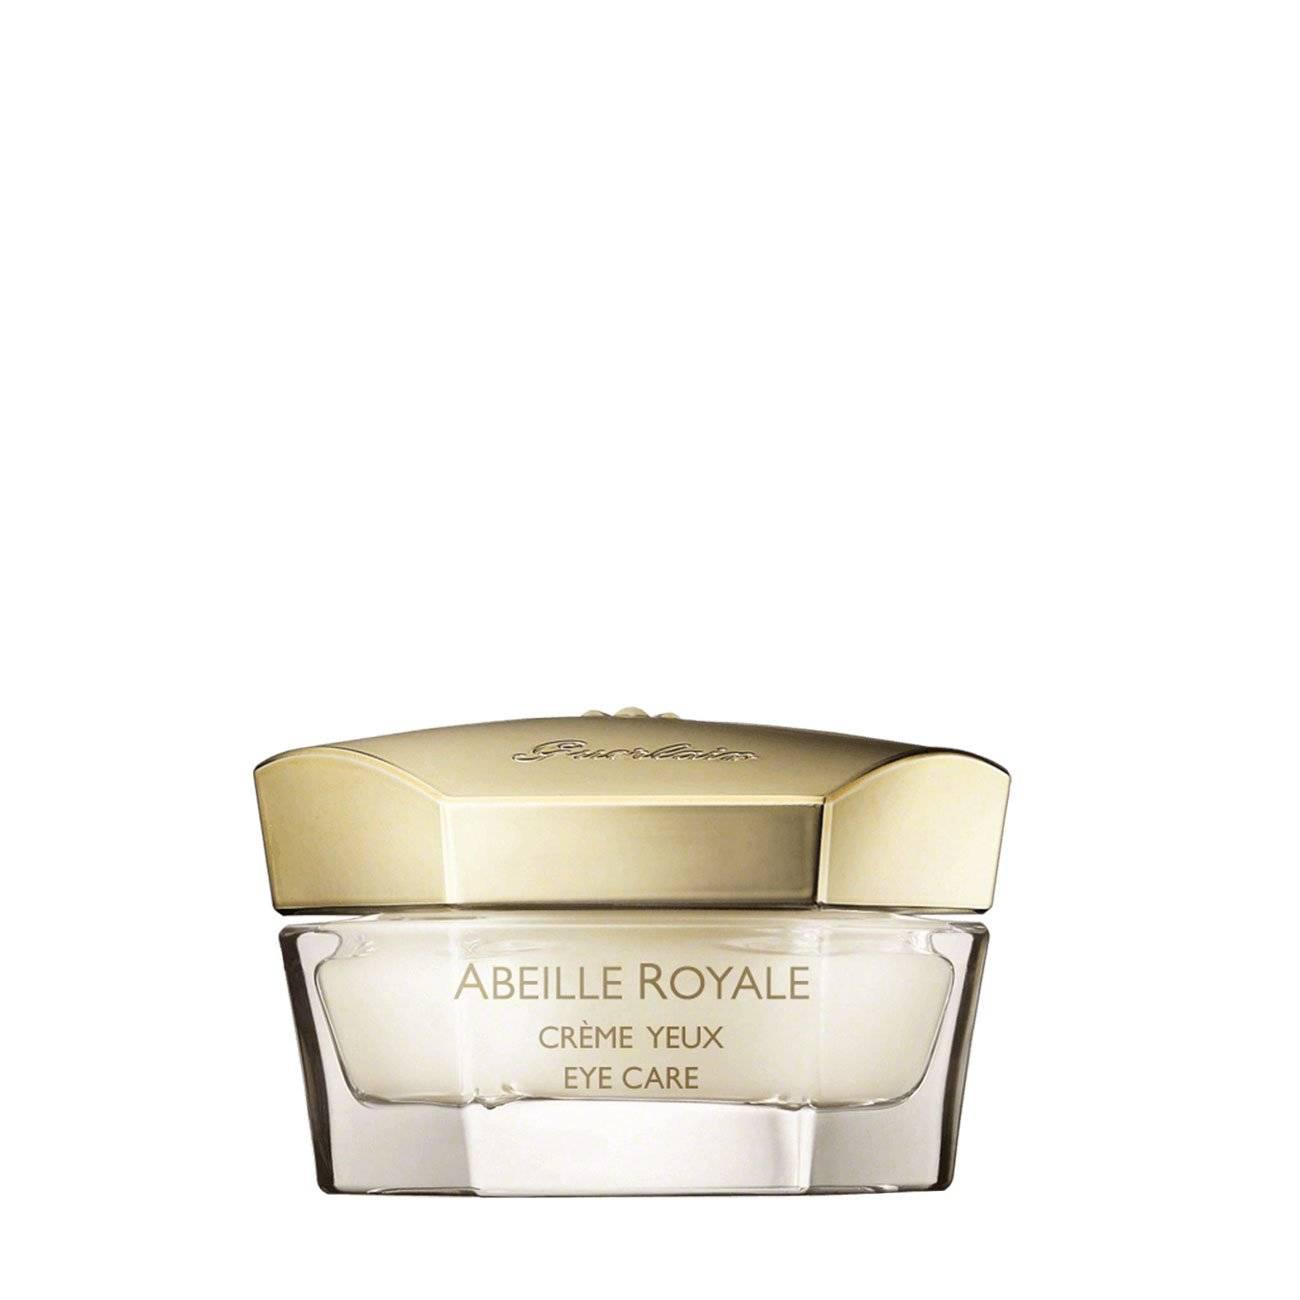 Abeille Royale Eye Cream 15ml